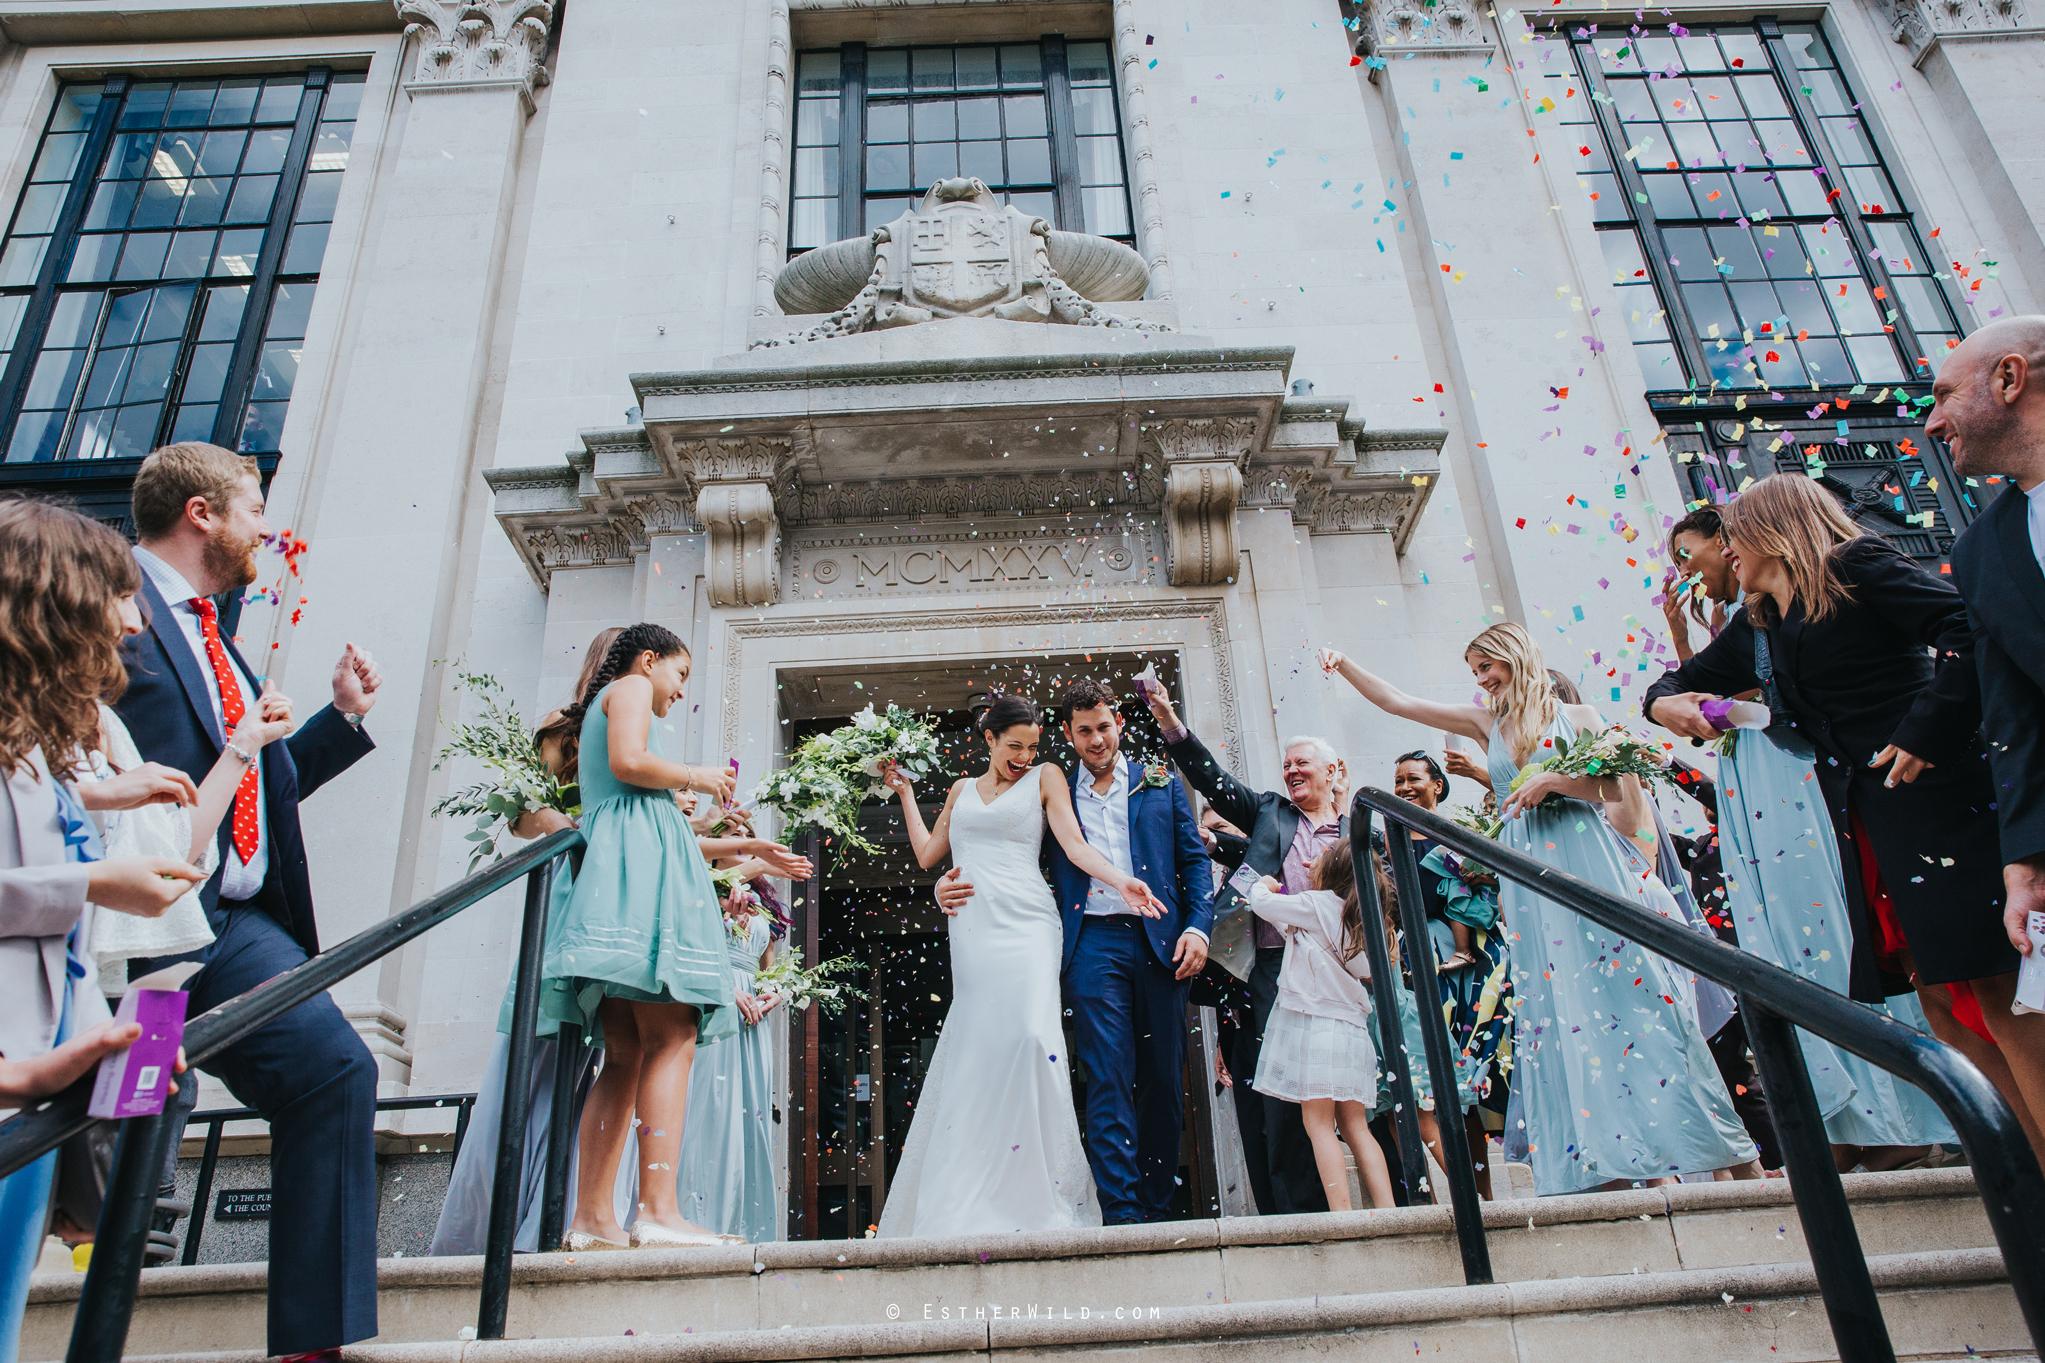 Islington_Town_Hall_Wedding_London_Photographer_Esther_Wild_IMG_5222.jpg